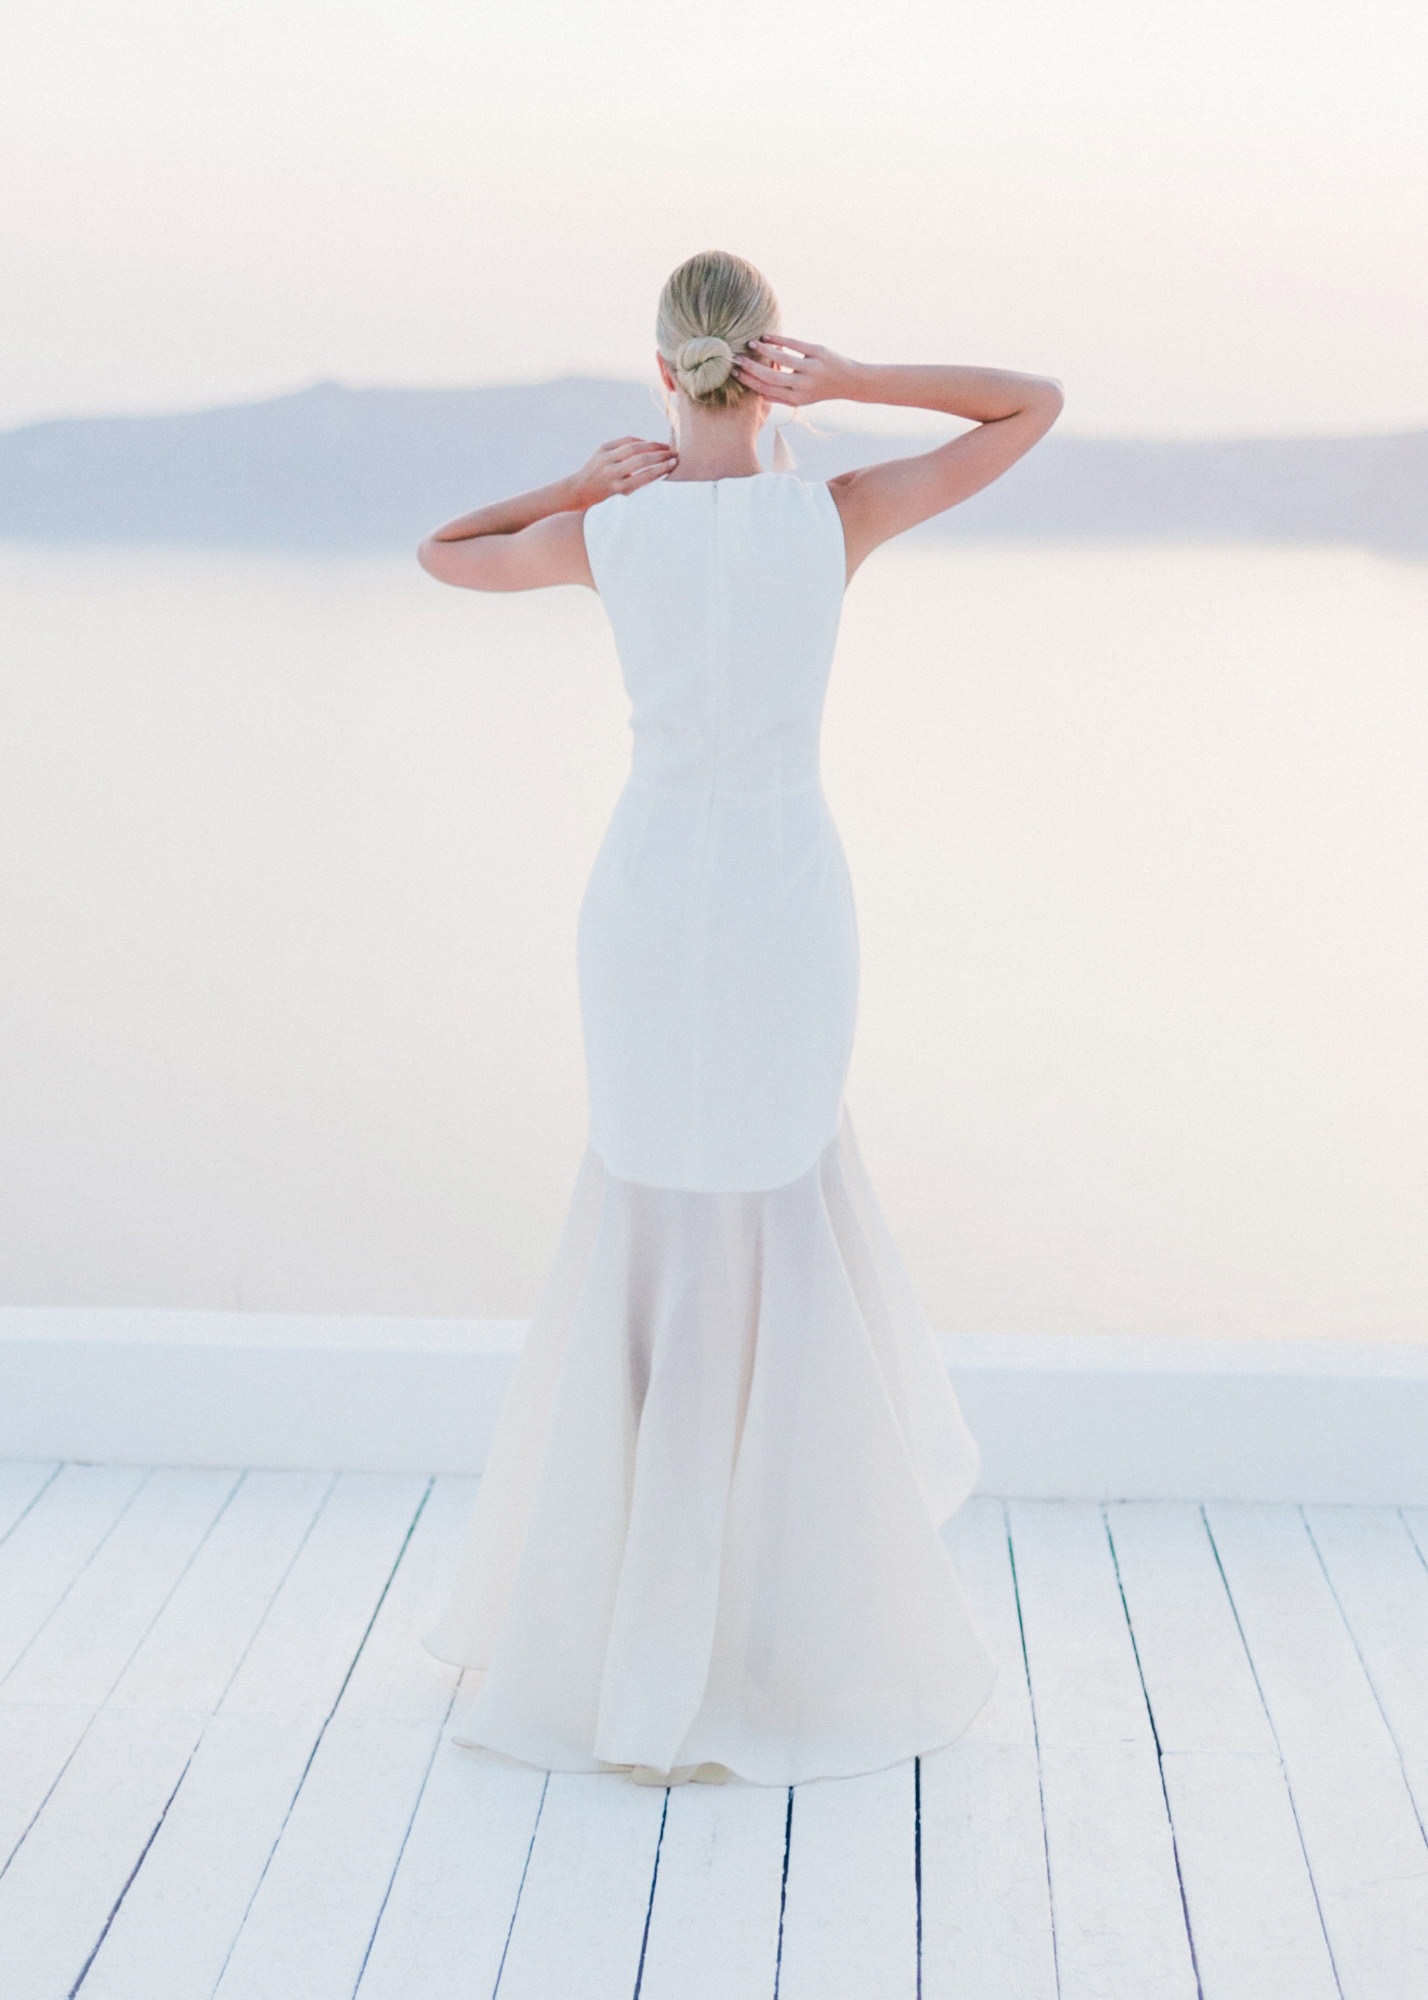 96-portrait-santorini-wedding-photographer-greece-b-v